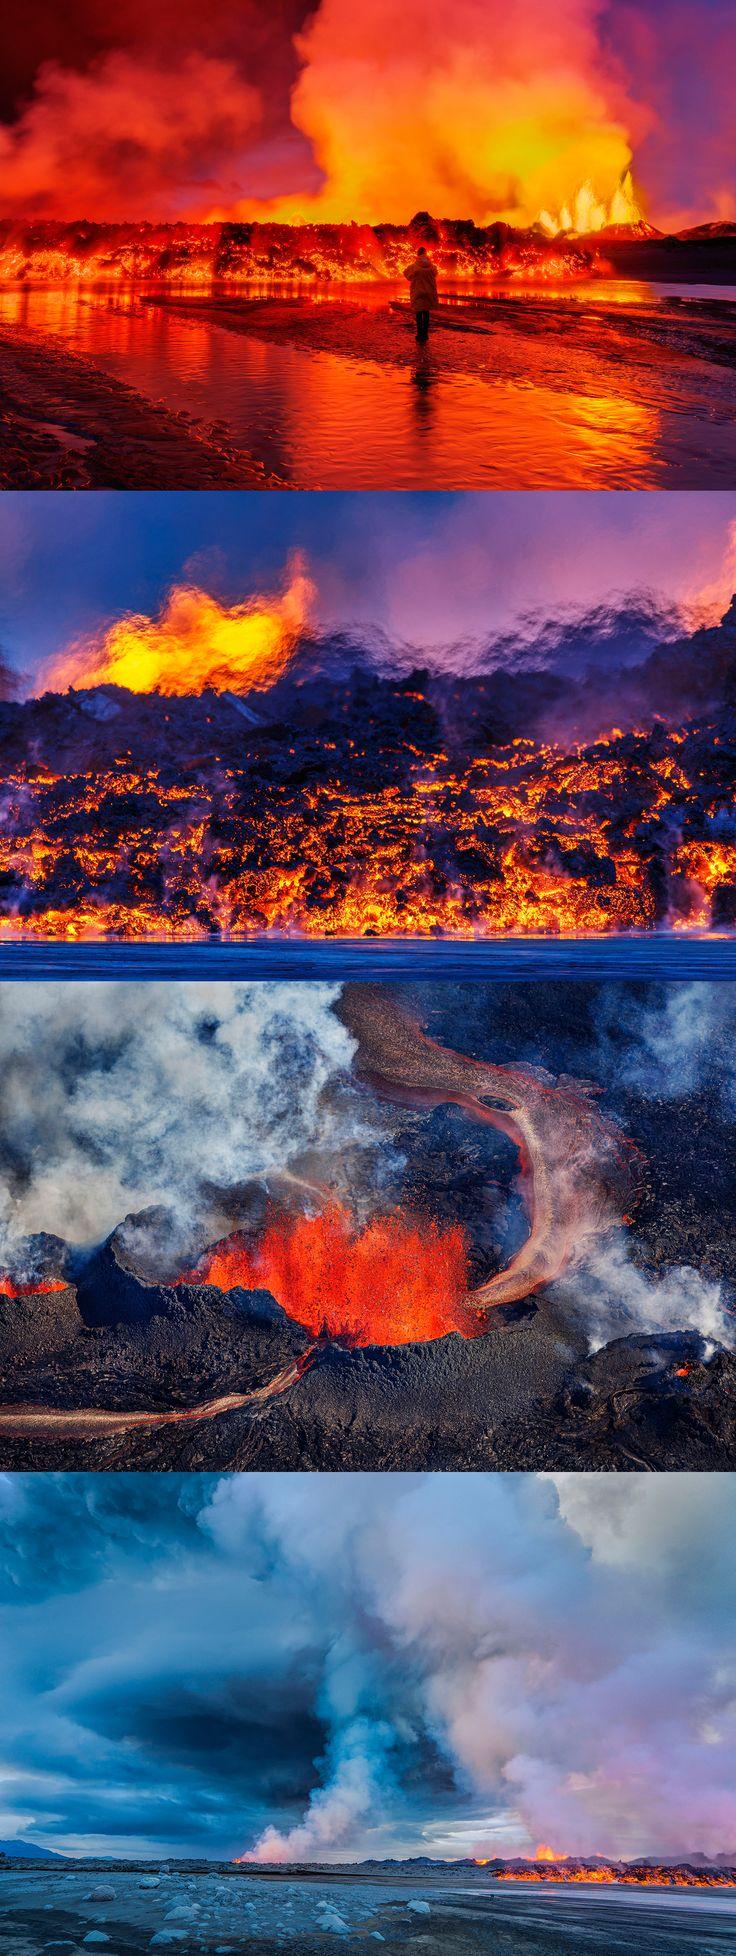 Photos of Iceland's Bardabunga volcano erupting.